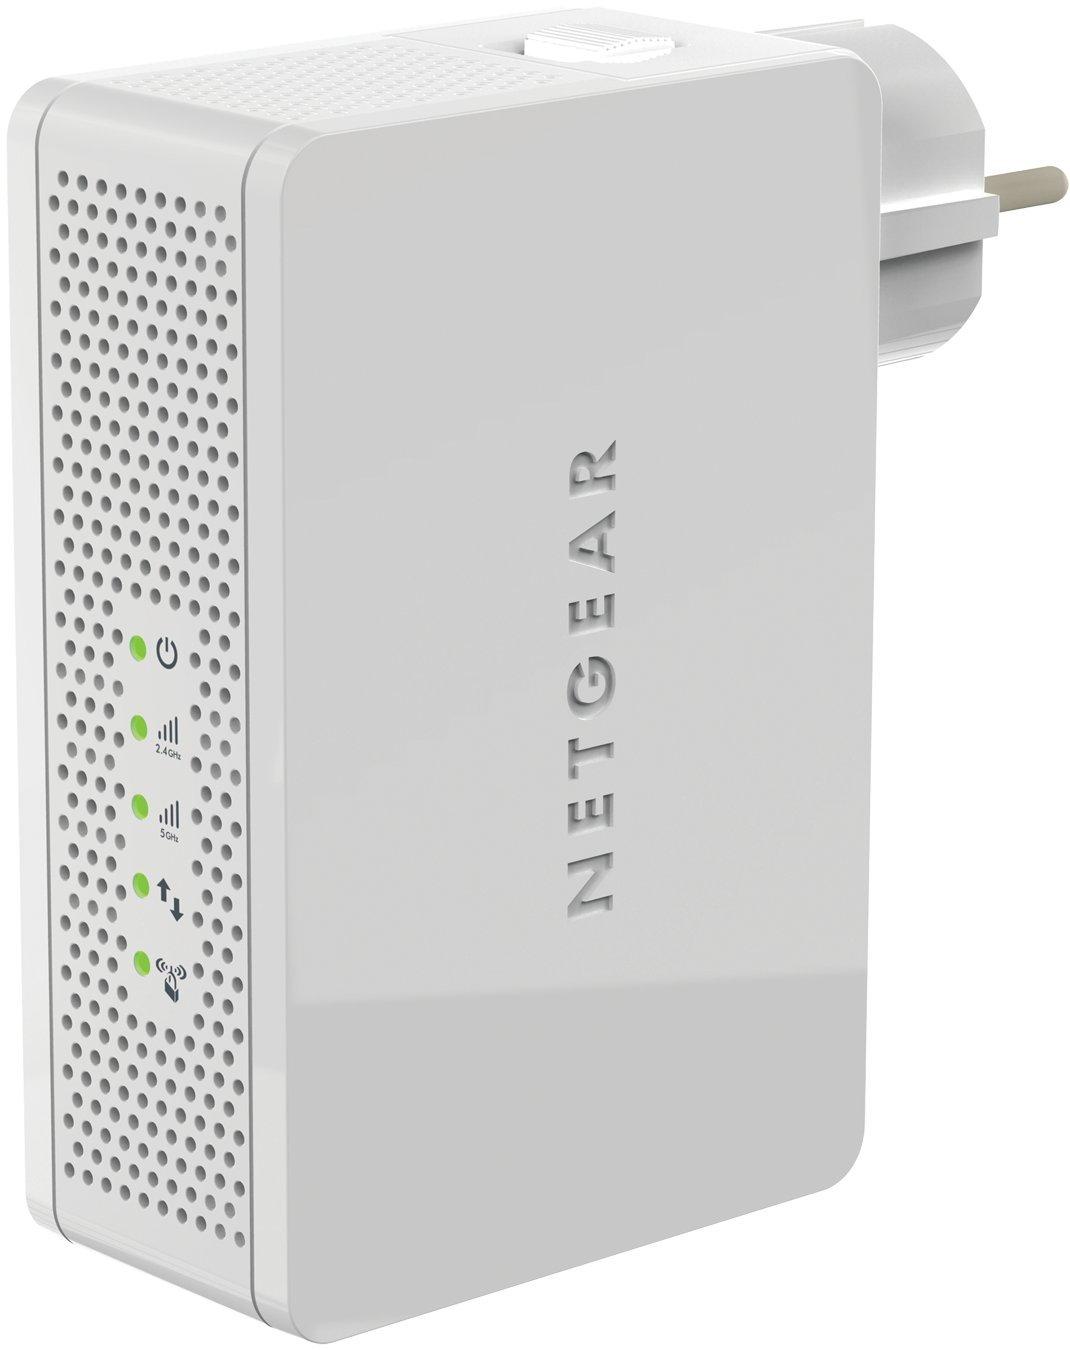 Netgear WN3500RP-100PES Wall-Plug Edition